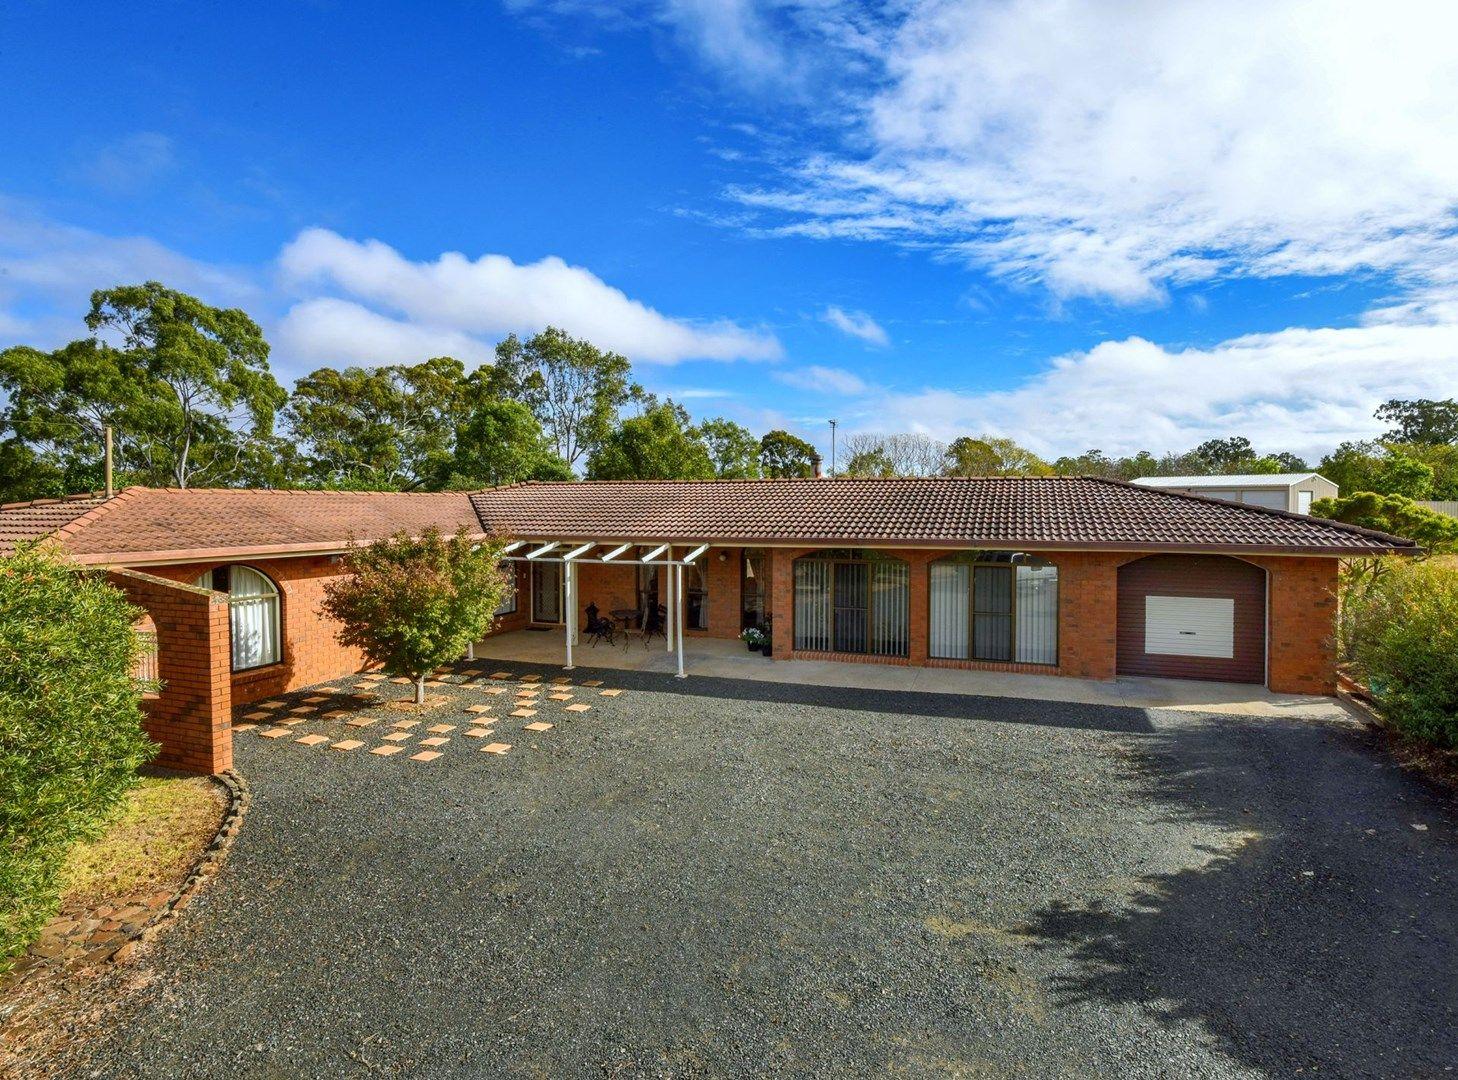 65 Valley View Drive, Meringandan West QLD 4352, Image 0